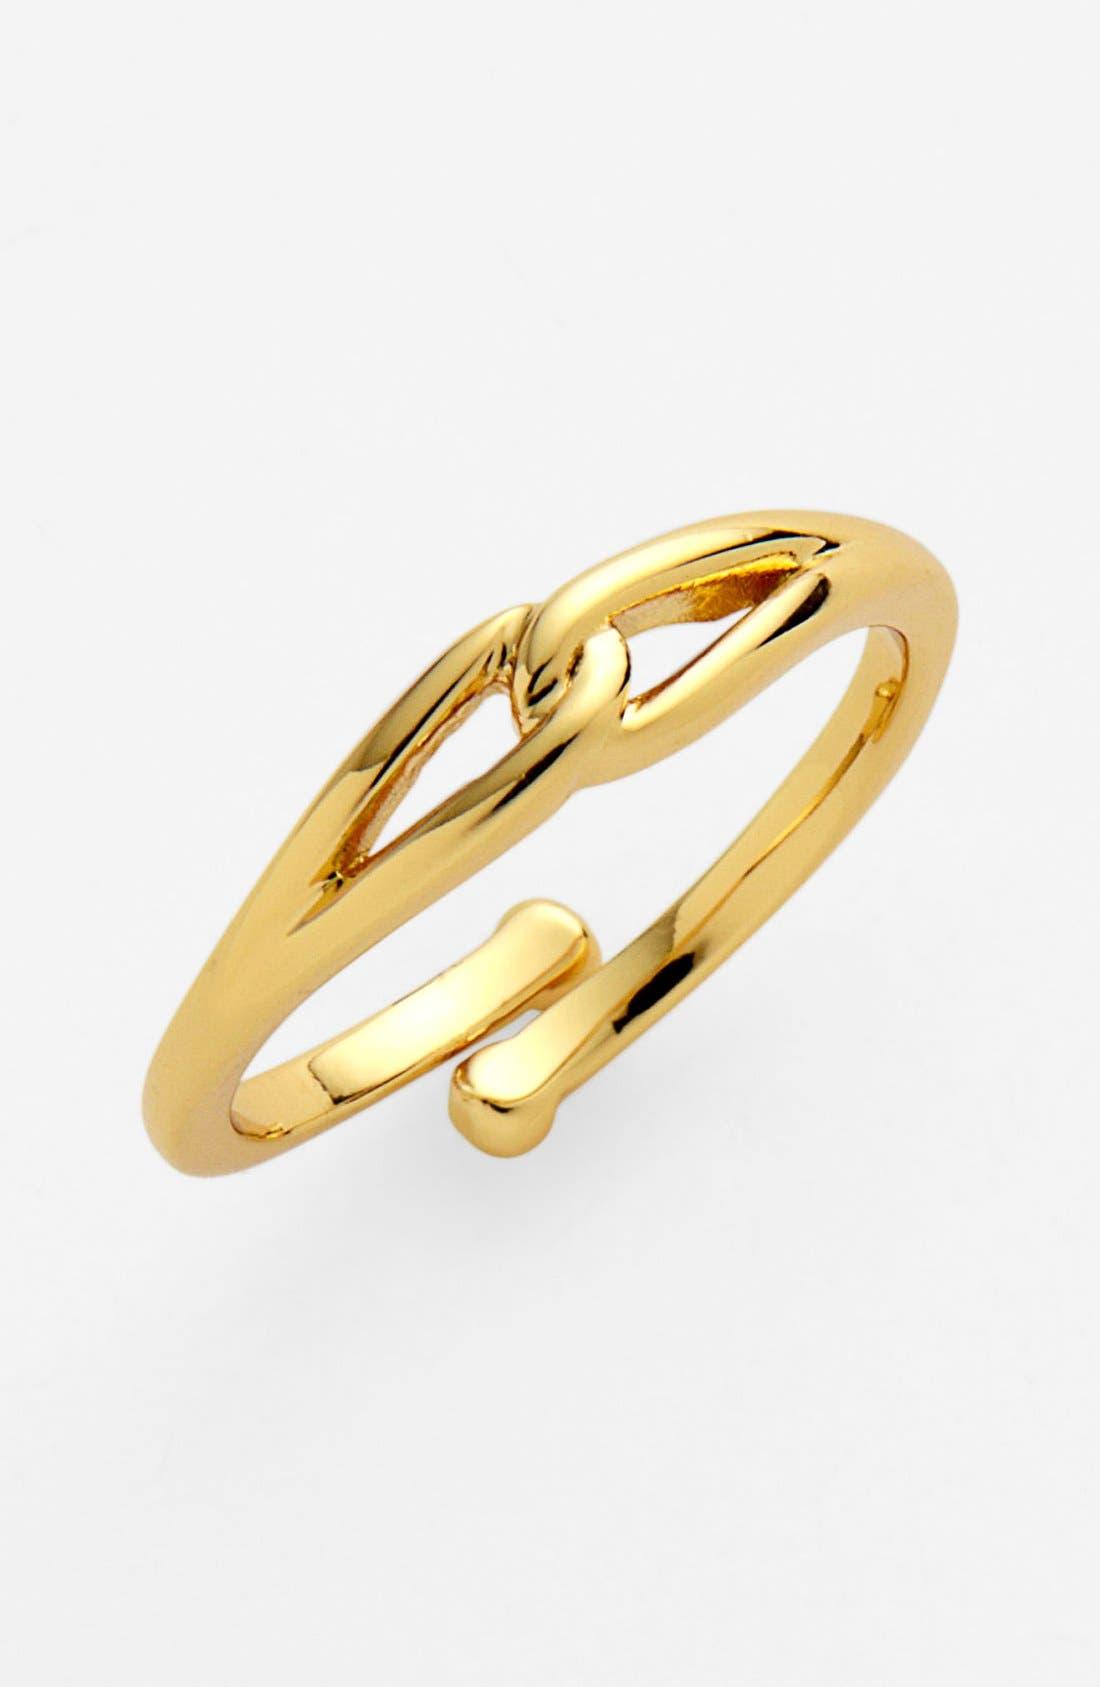 Midi Ring,                             Main thumbnail 1, color,                             710